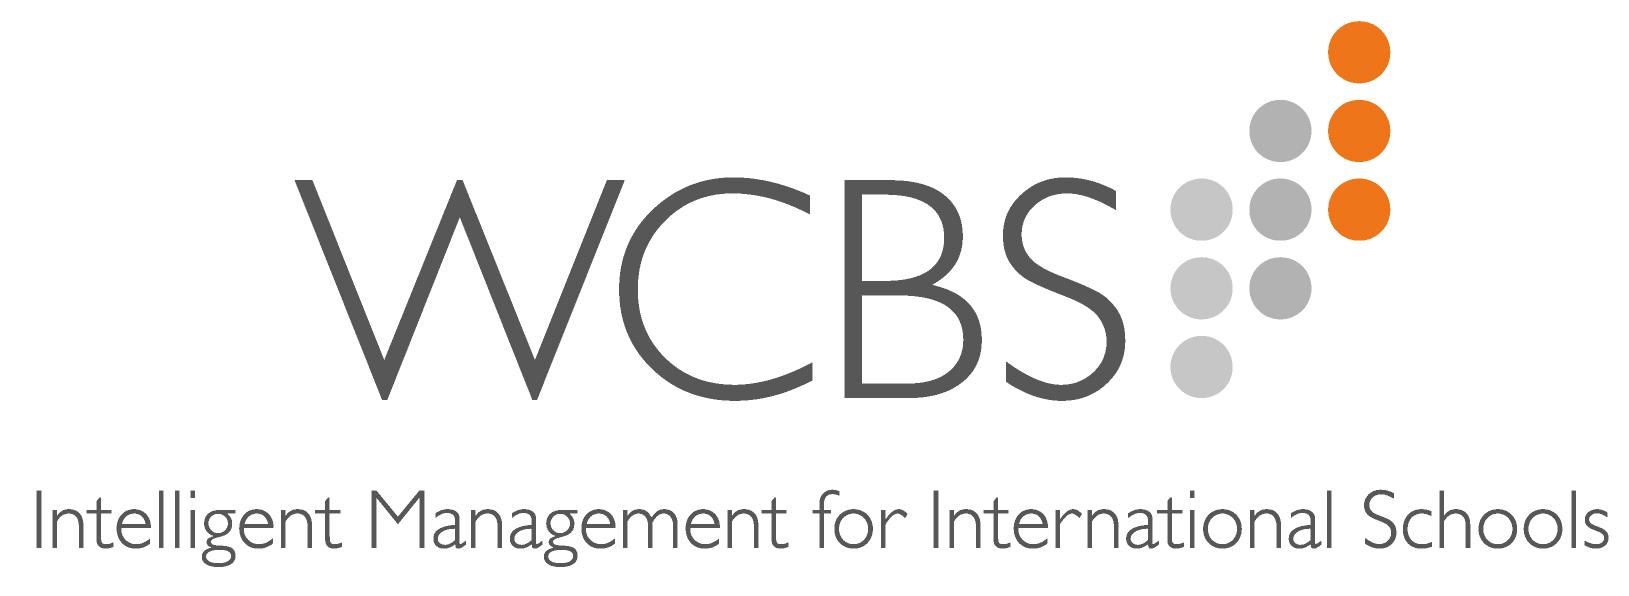 Bursars HR Conference 2018 - Council of British